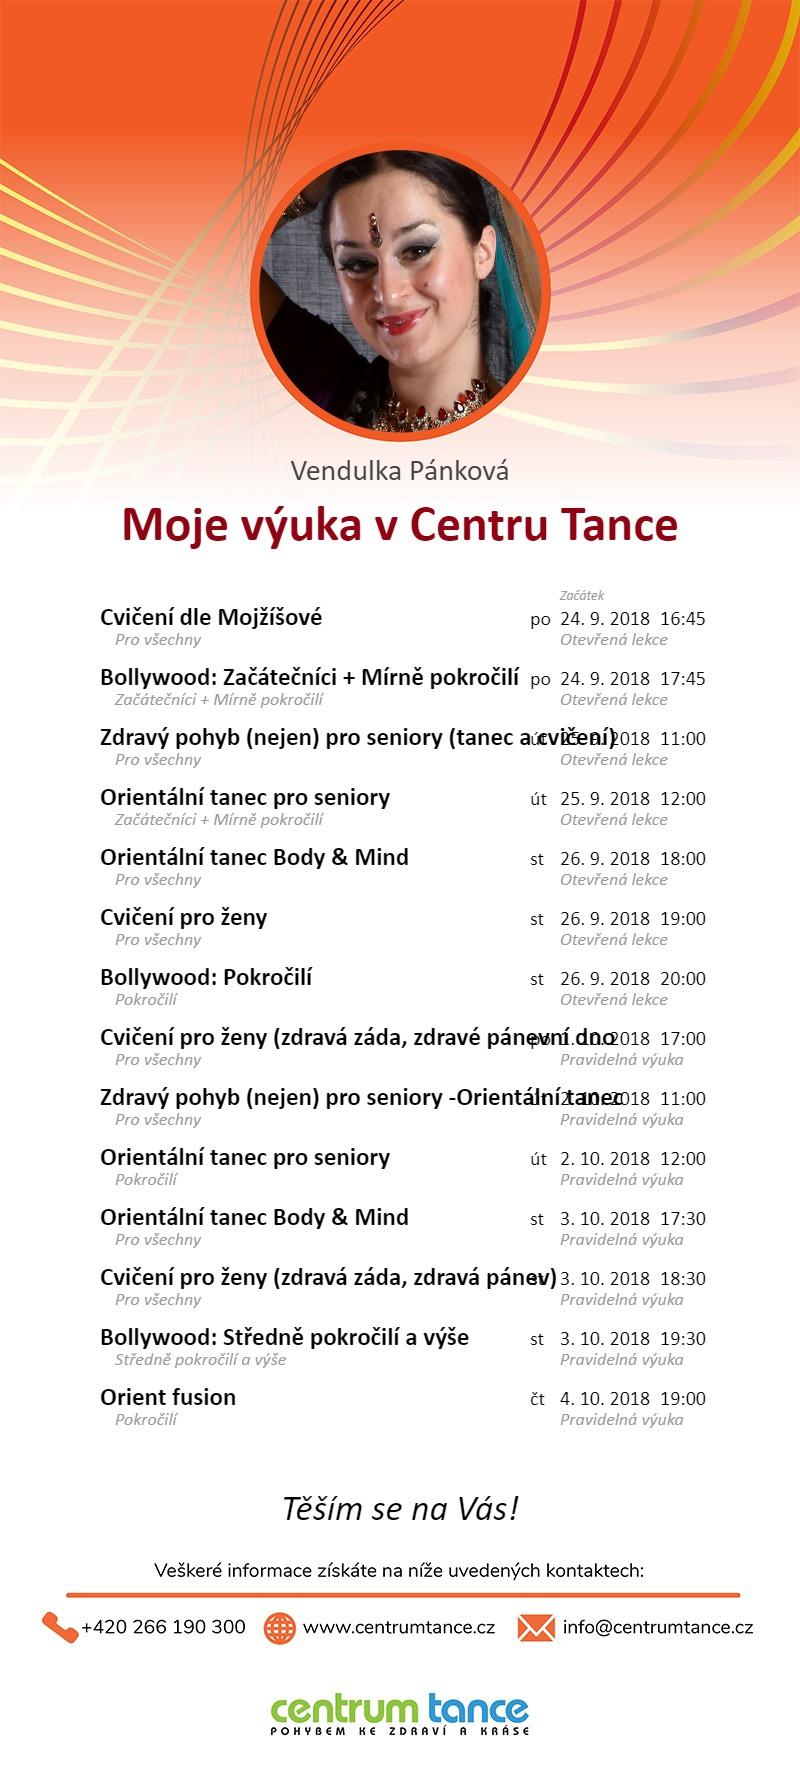 Vendulka - kurzy v Centru tance - jaro 2018